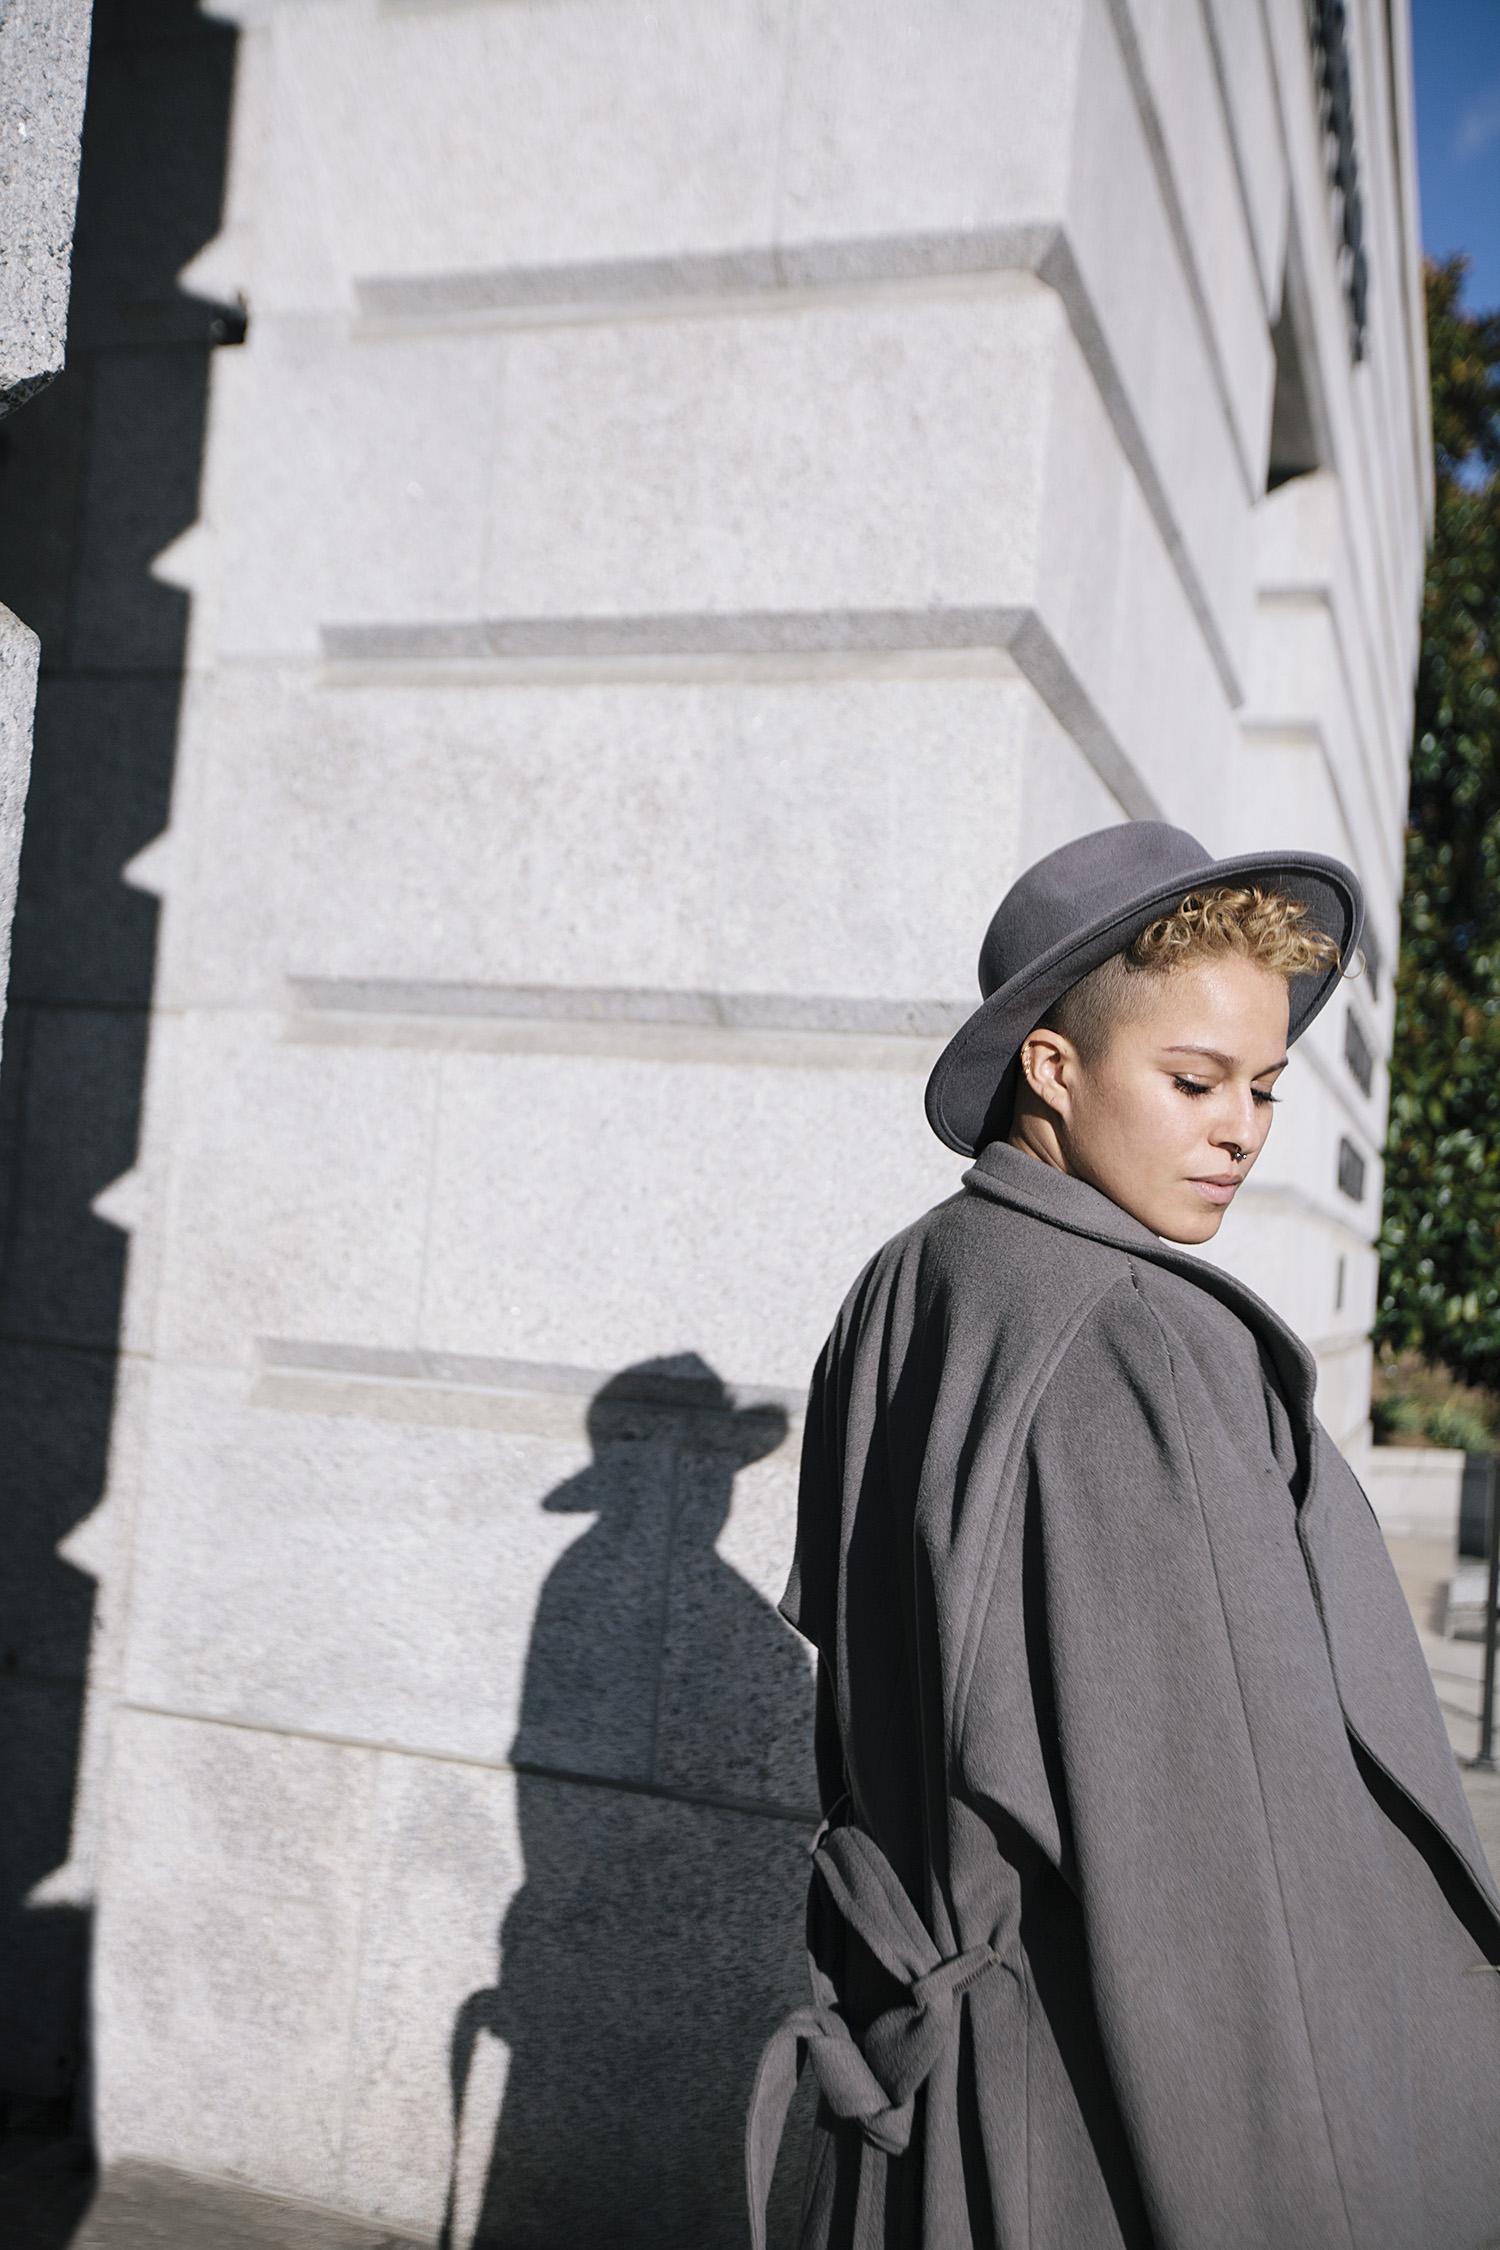 lifestyle-editorial-washington-dc-malek-naz-photography-national-portrait-stylist.jpg